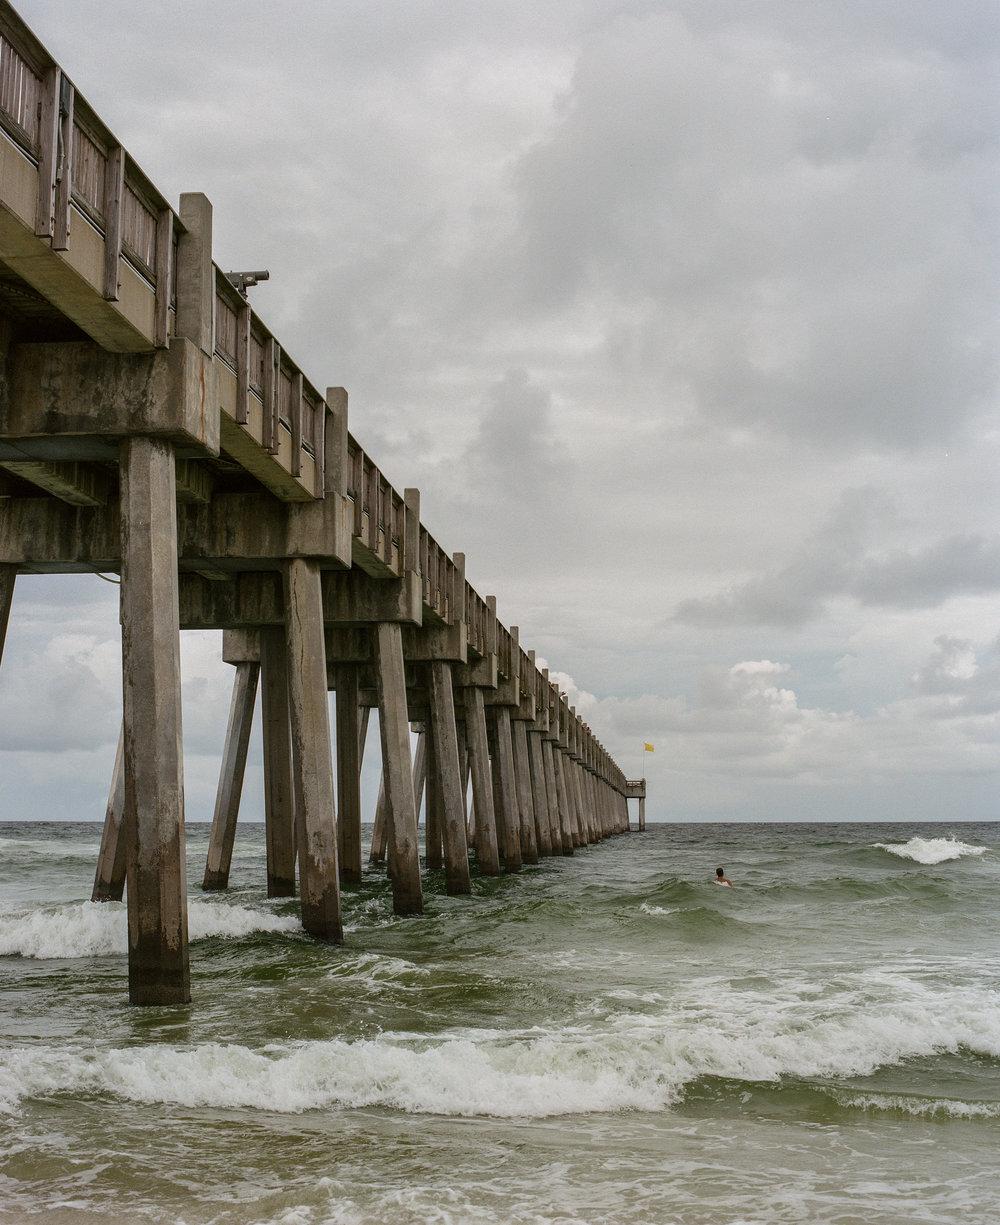 Pensacola, FL | Mamiya RB 67 w/ Portra 400